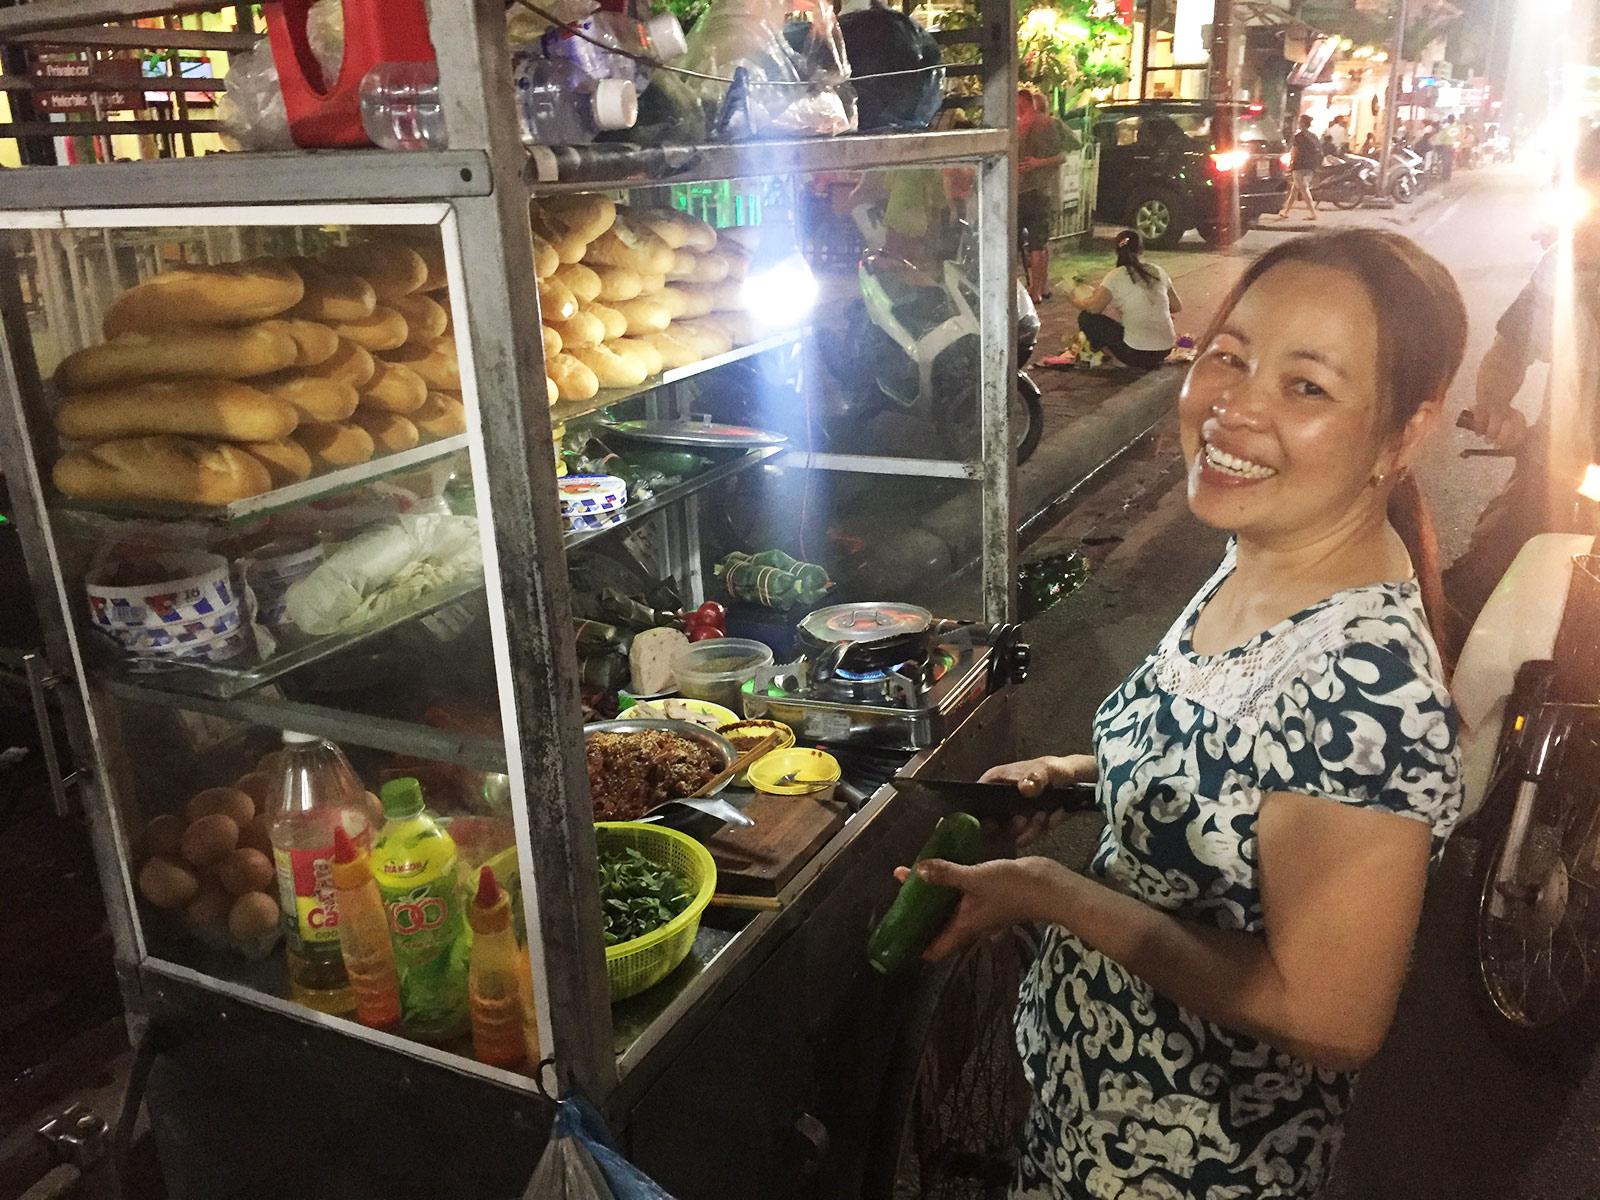 Reisebericht über Vietnam: Drei Monate Backpacking